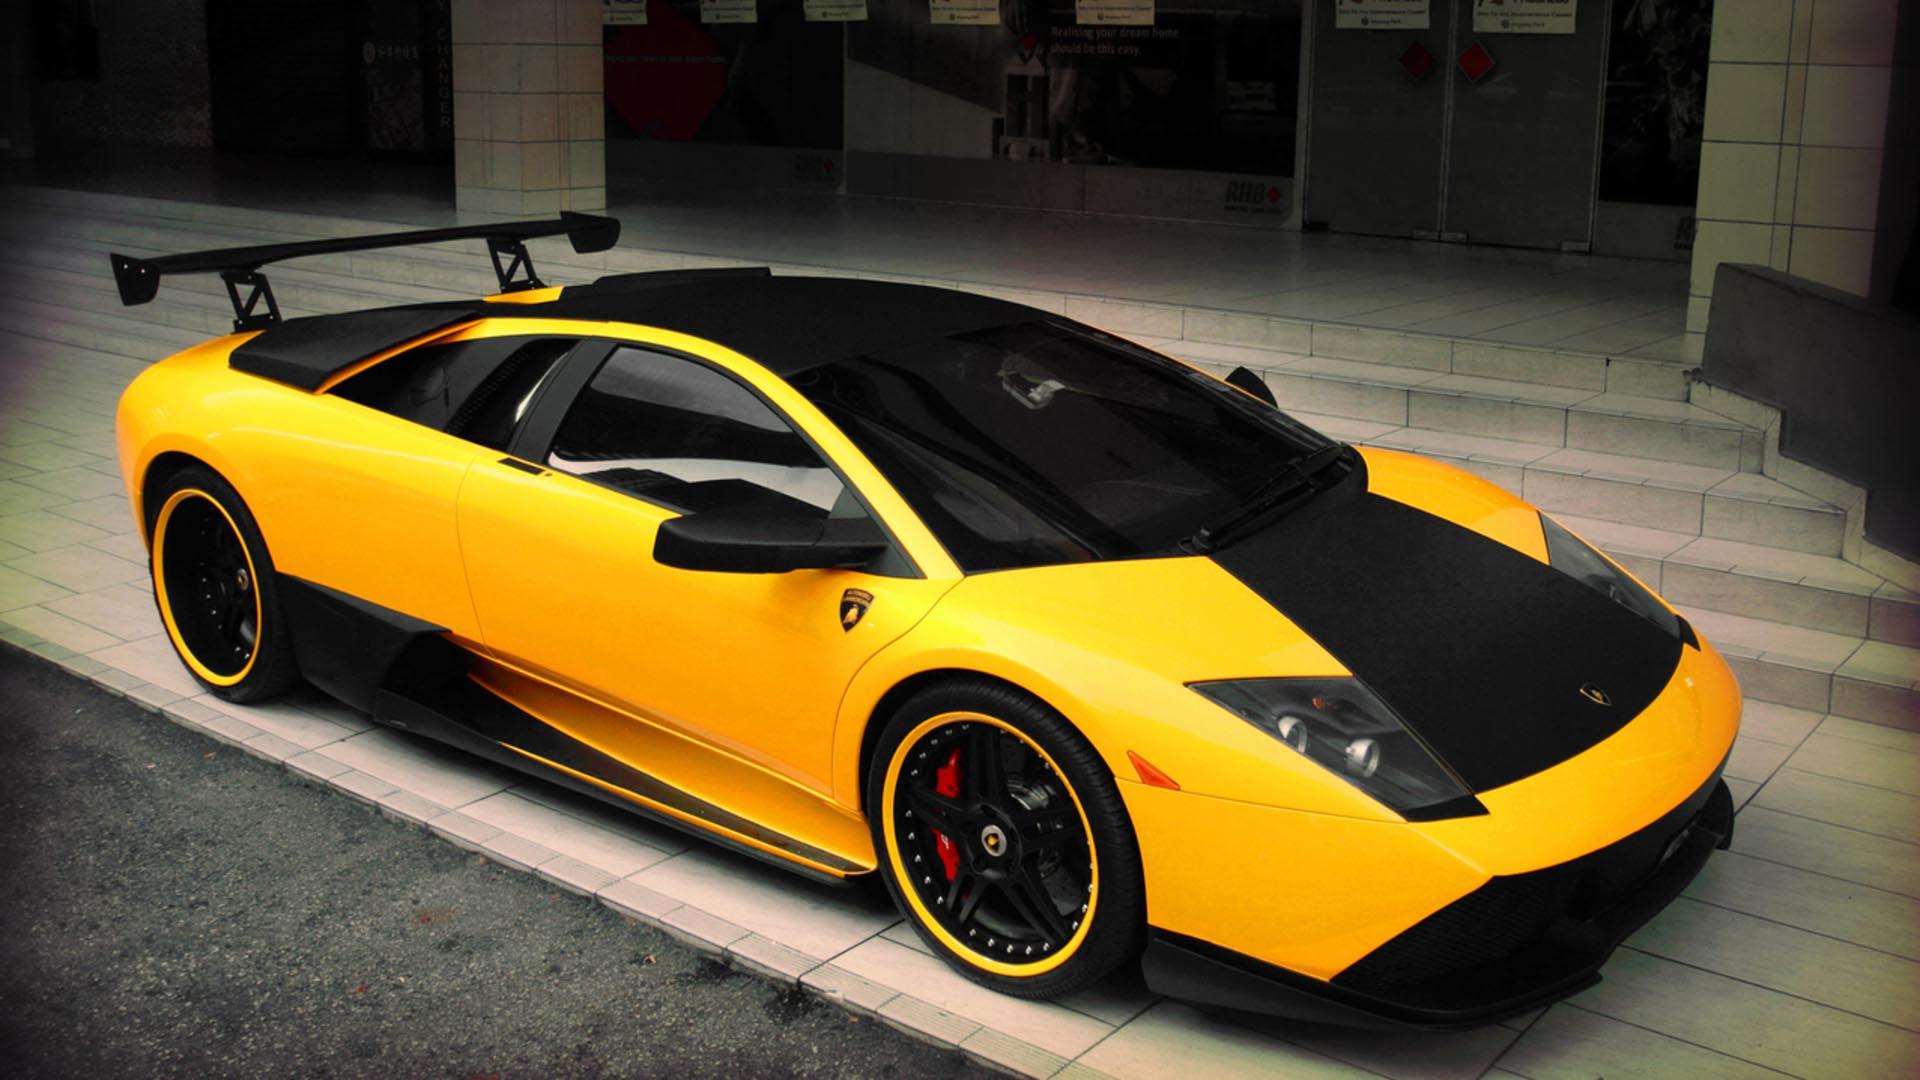 Cool Yellow Lamborghini Wallpaper